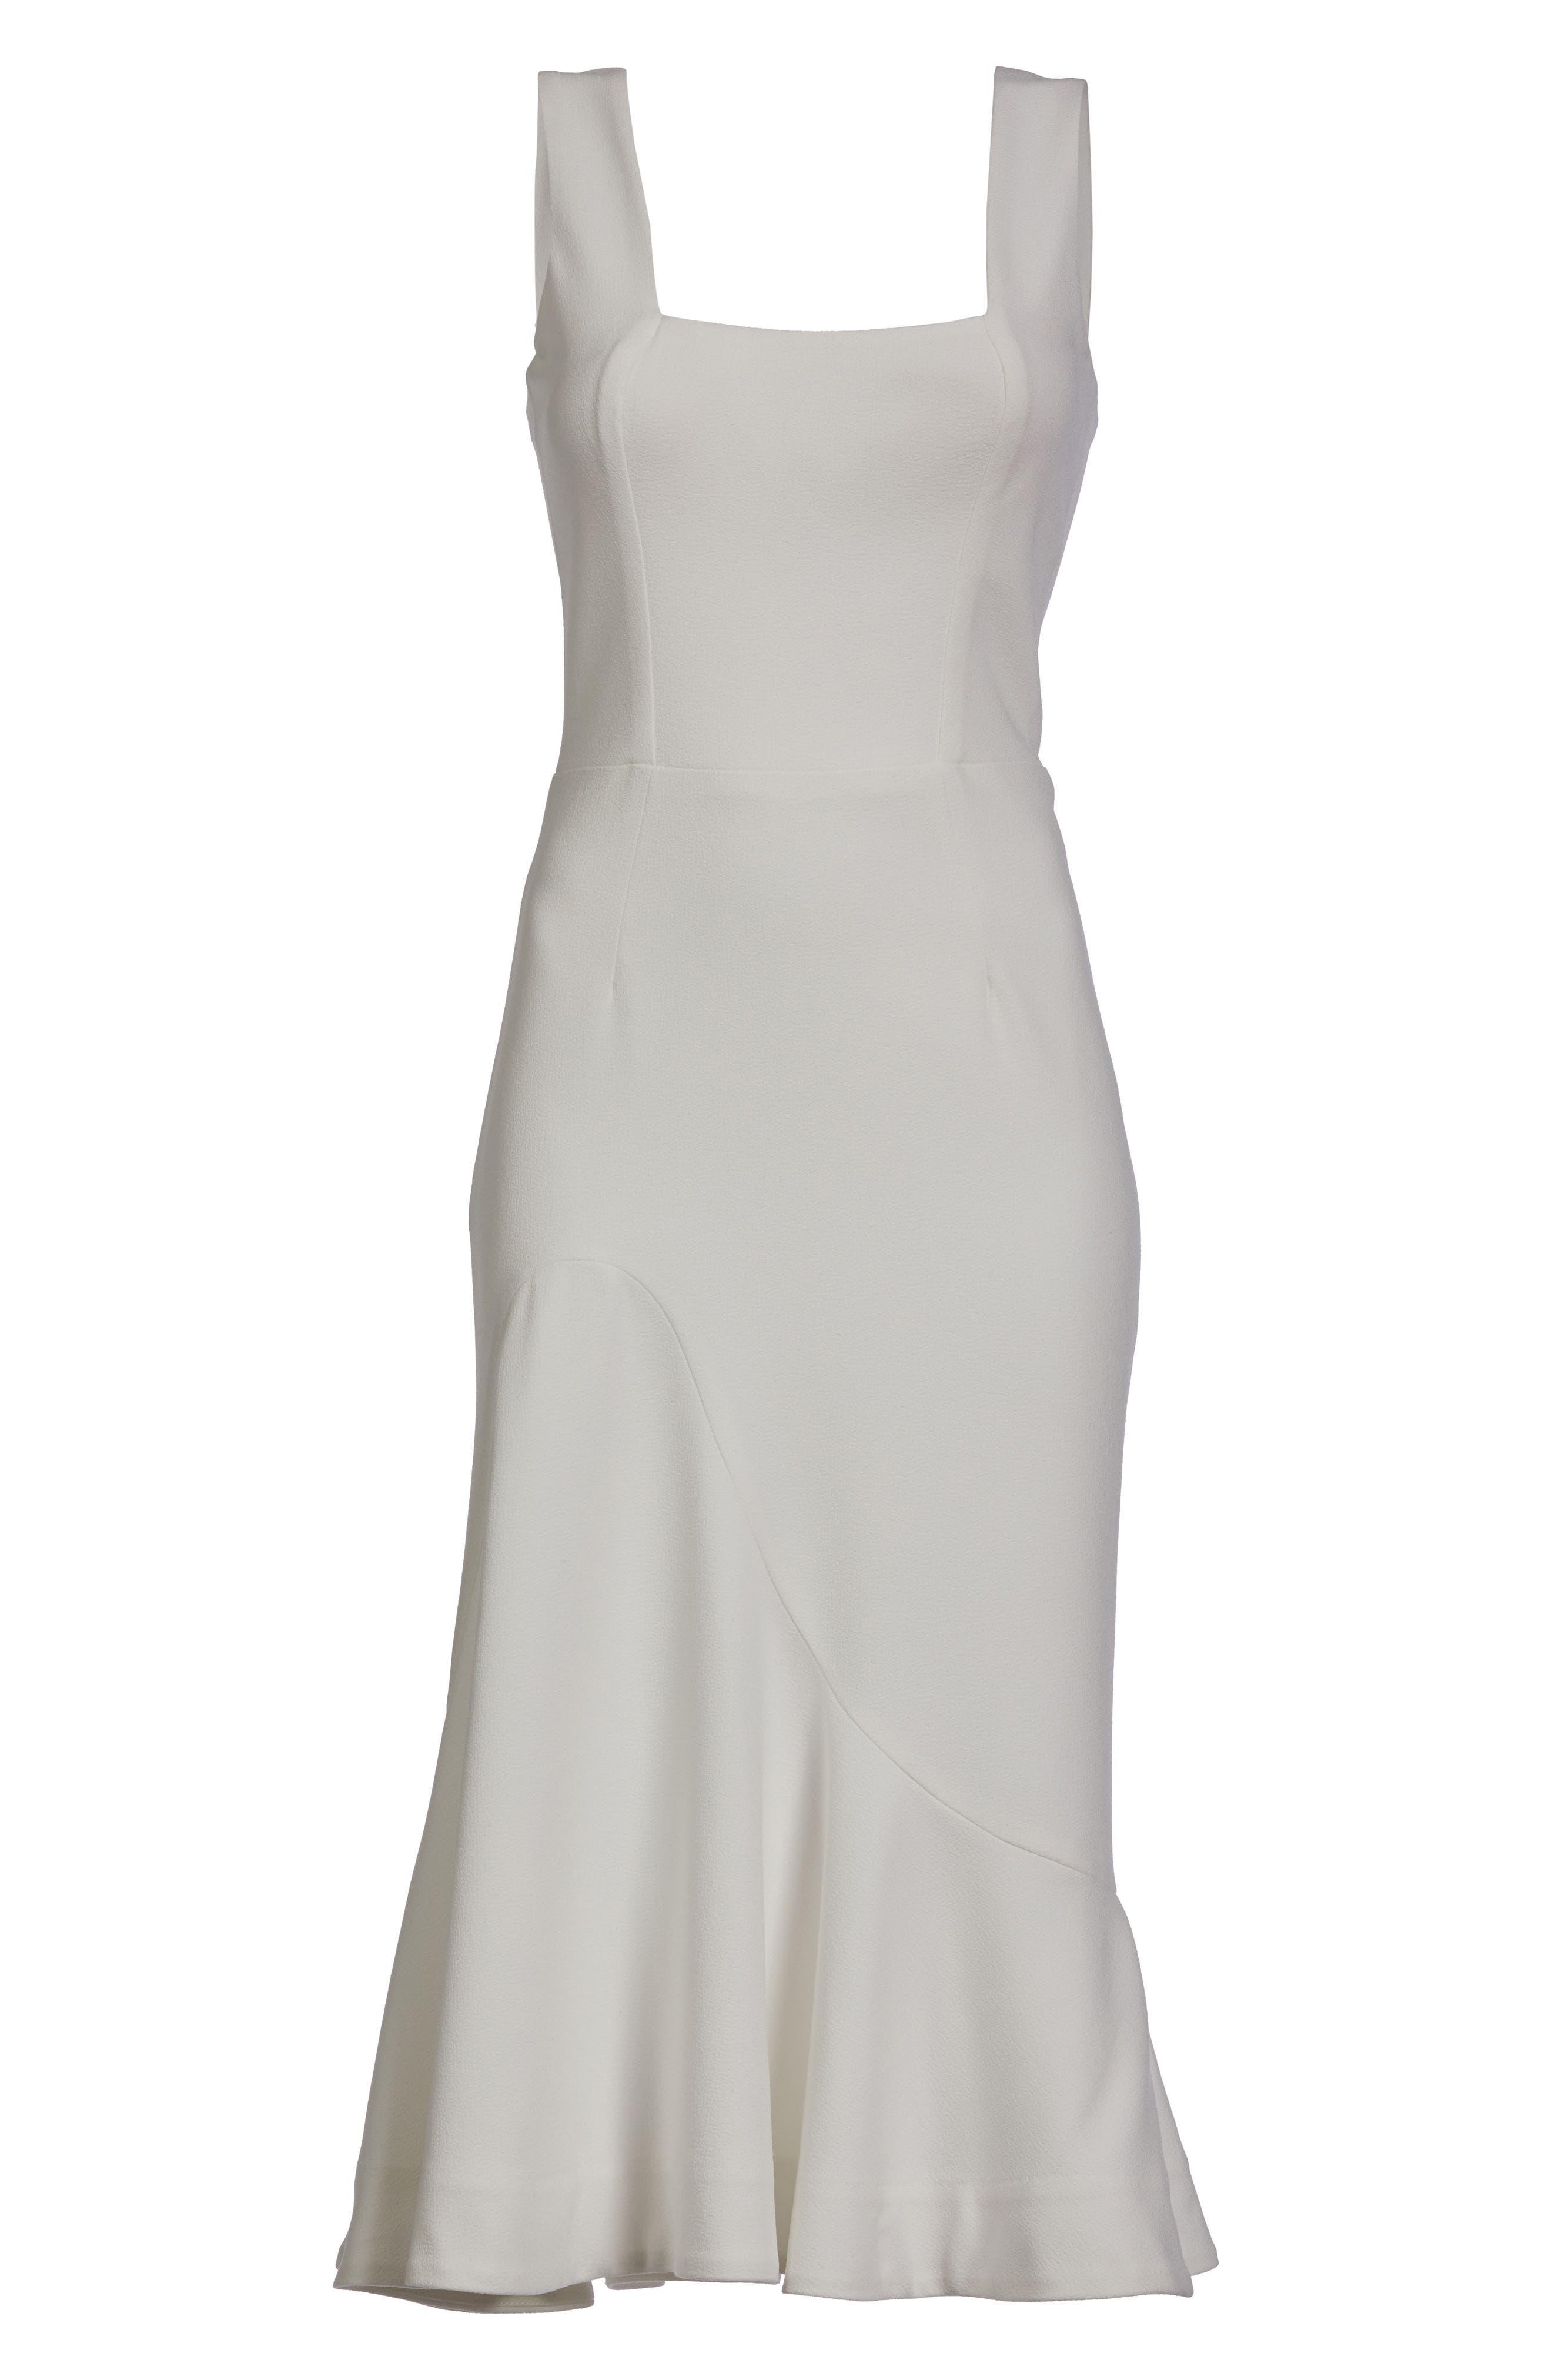 Monica Tea Length Trumpet Dress,                             Alternate thumbnail 4, color,                             Off White